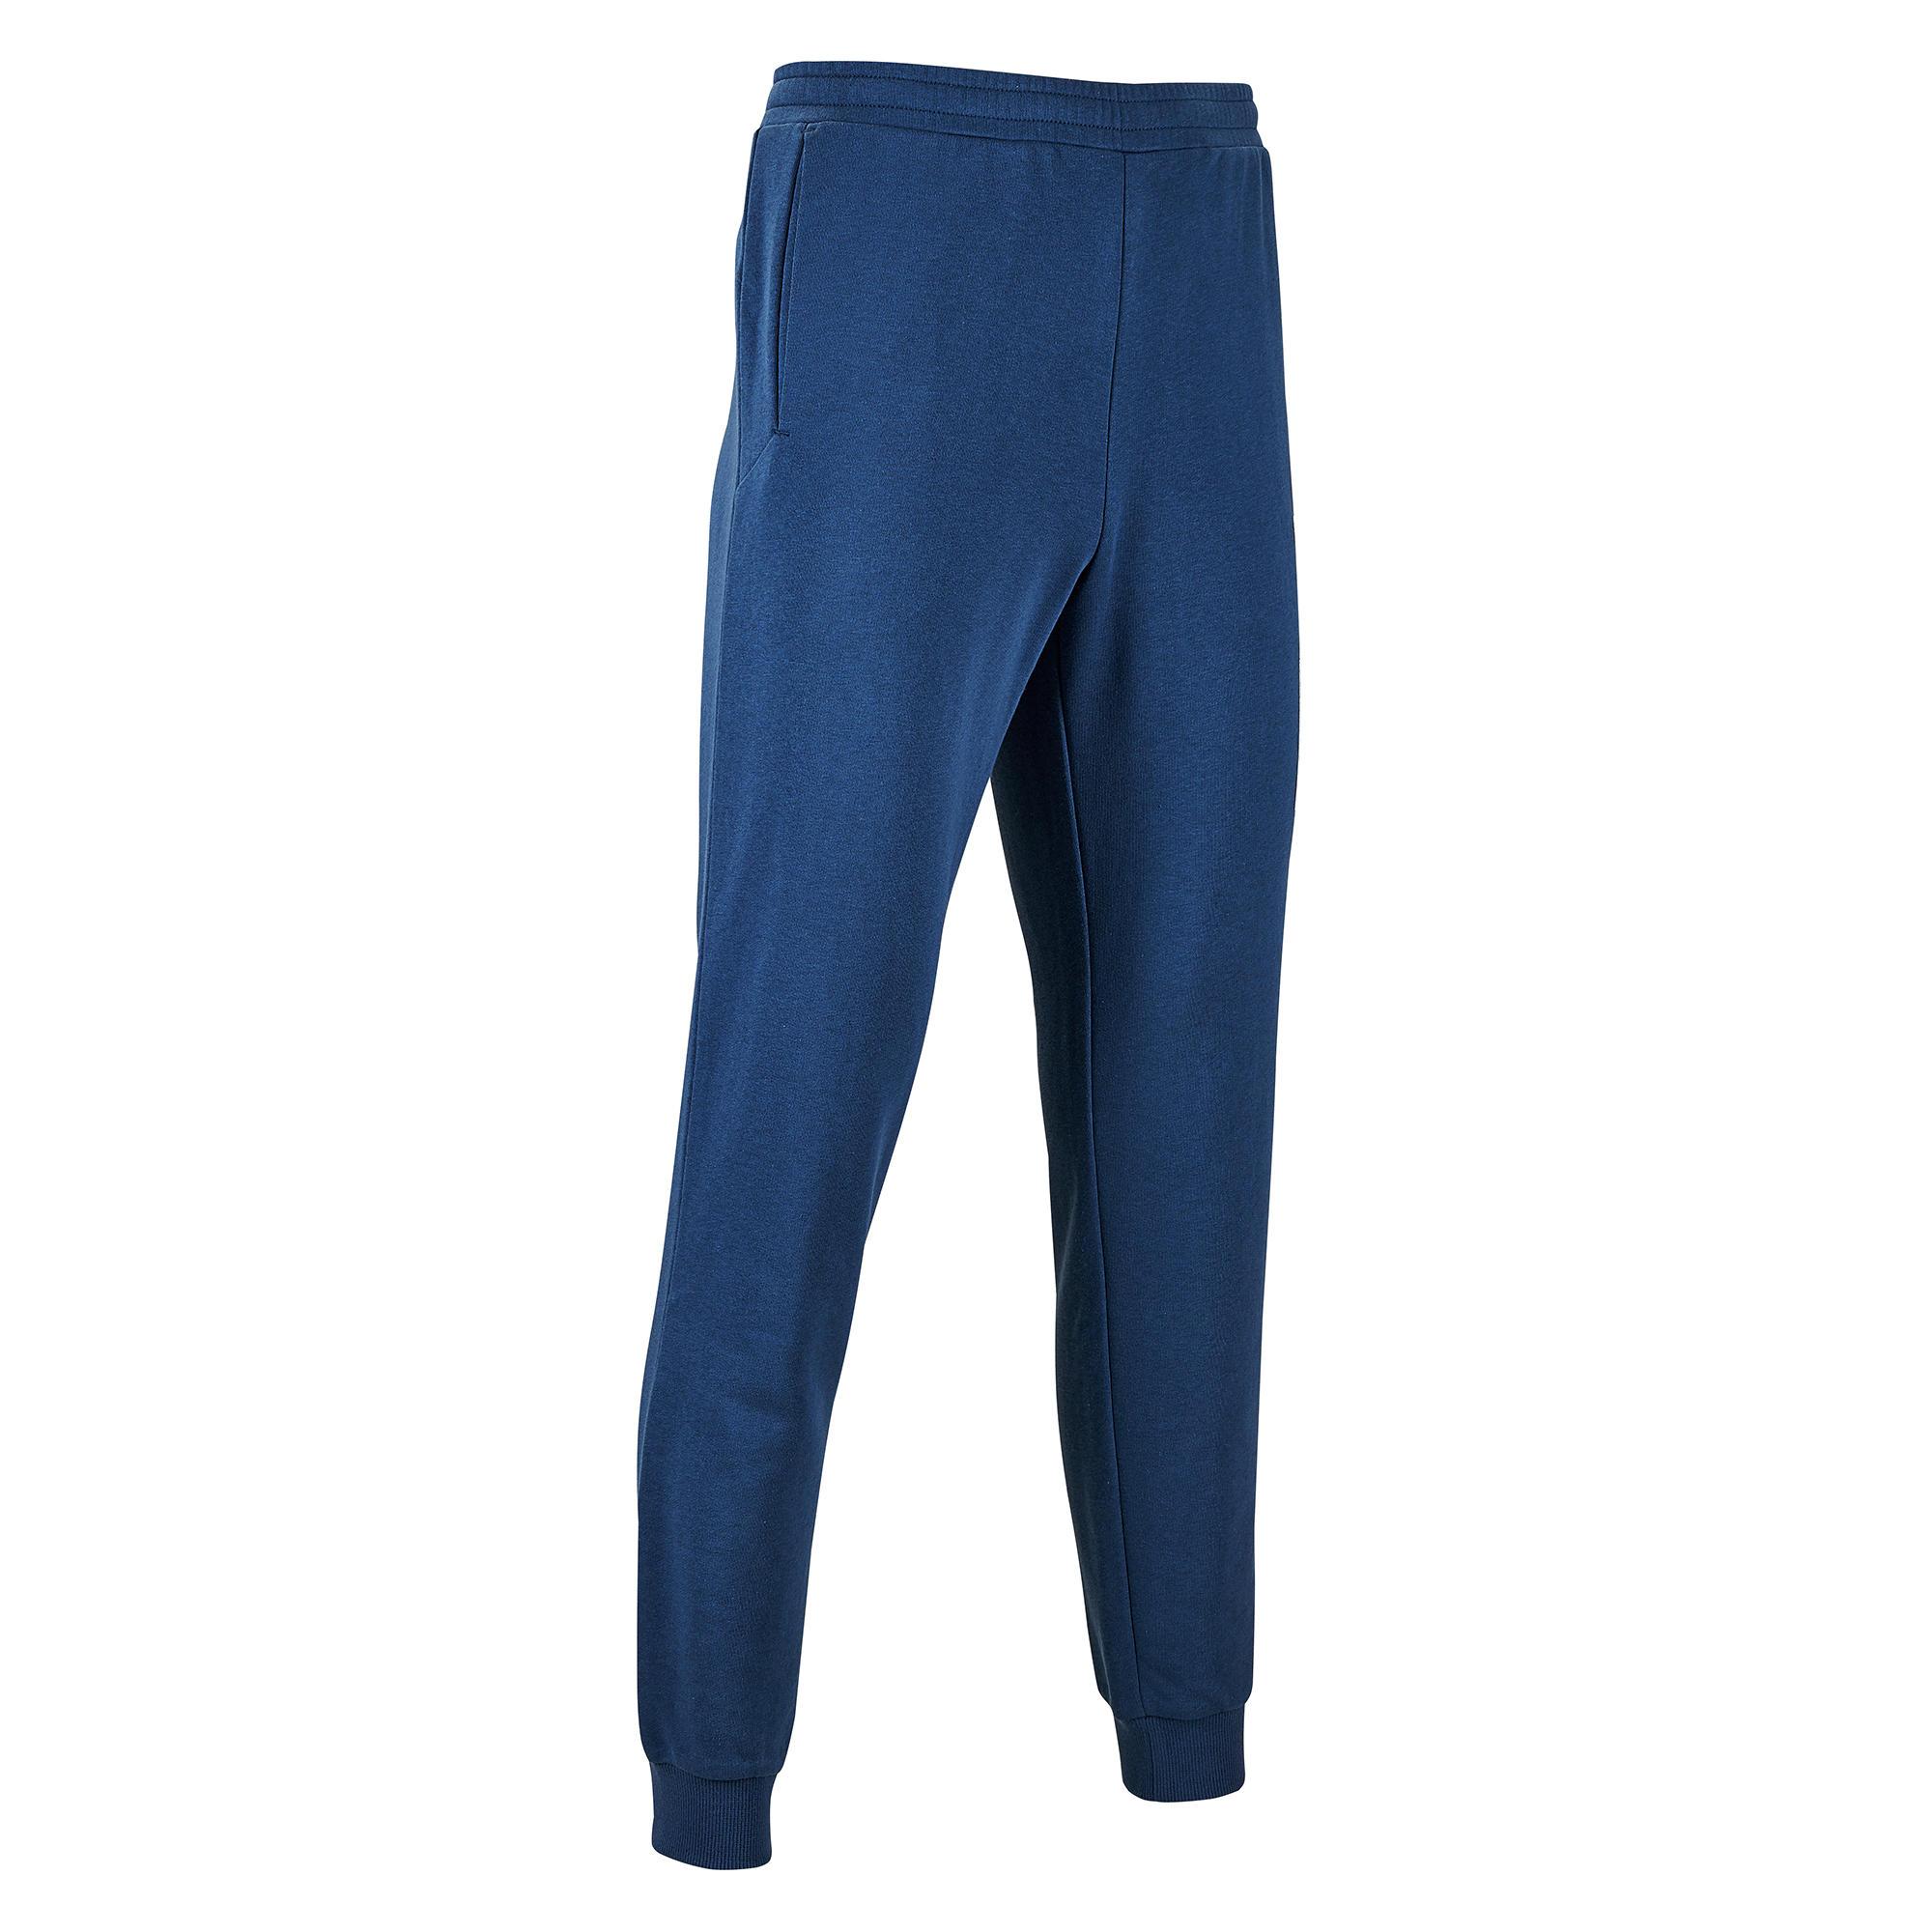 Pantalon trening PUMA bărbați la Reducere poza